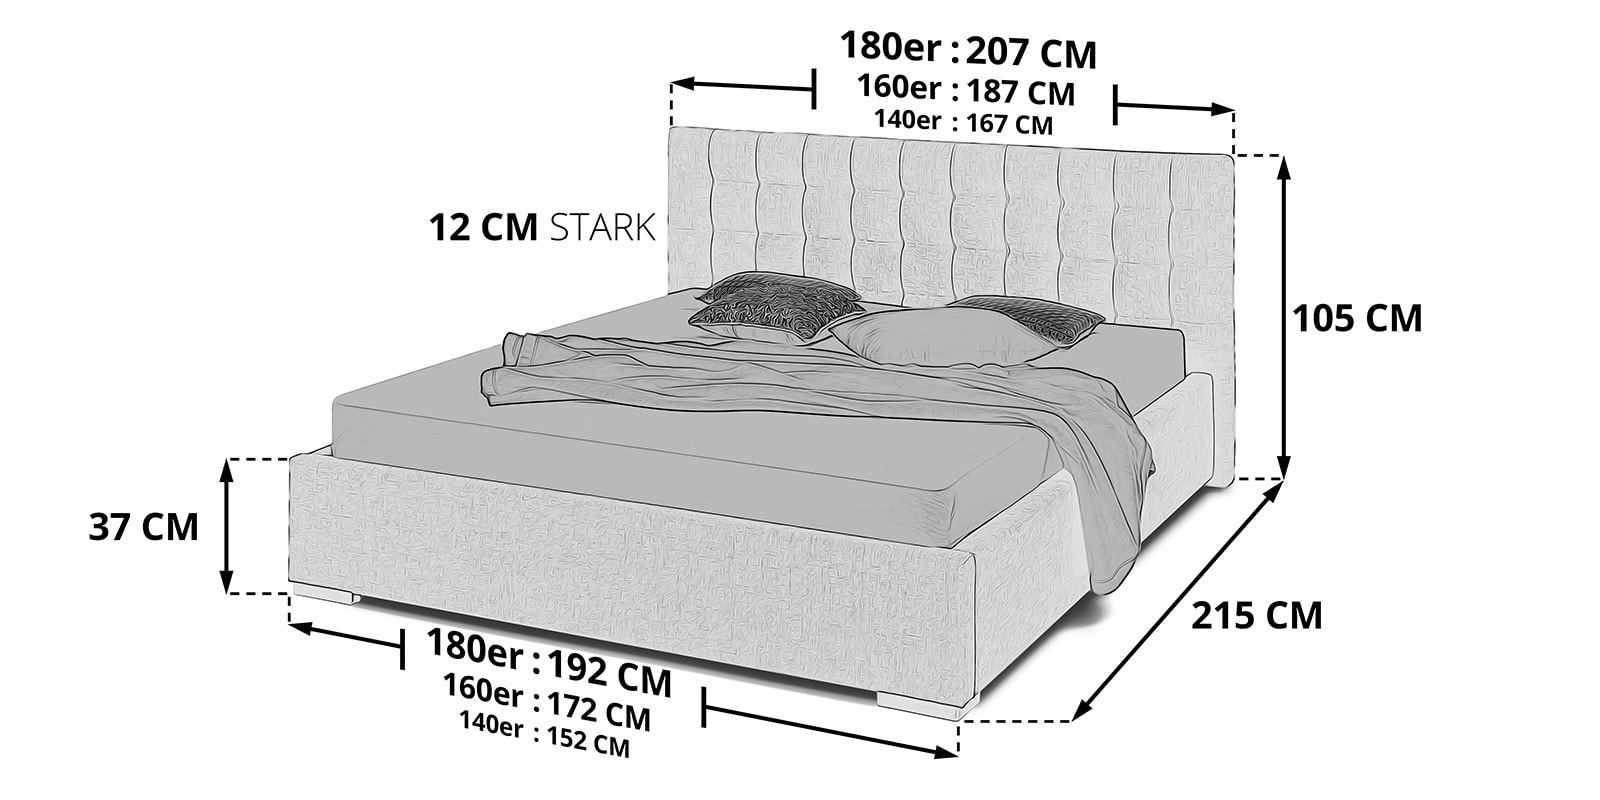 Polsterbett mit Bettkasten Jimmy skizze